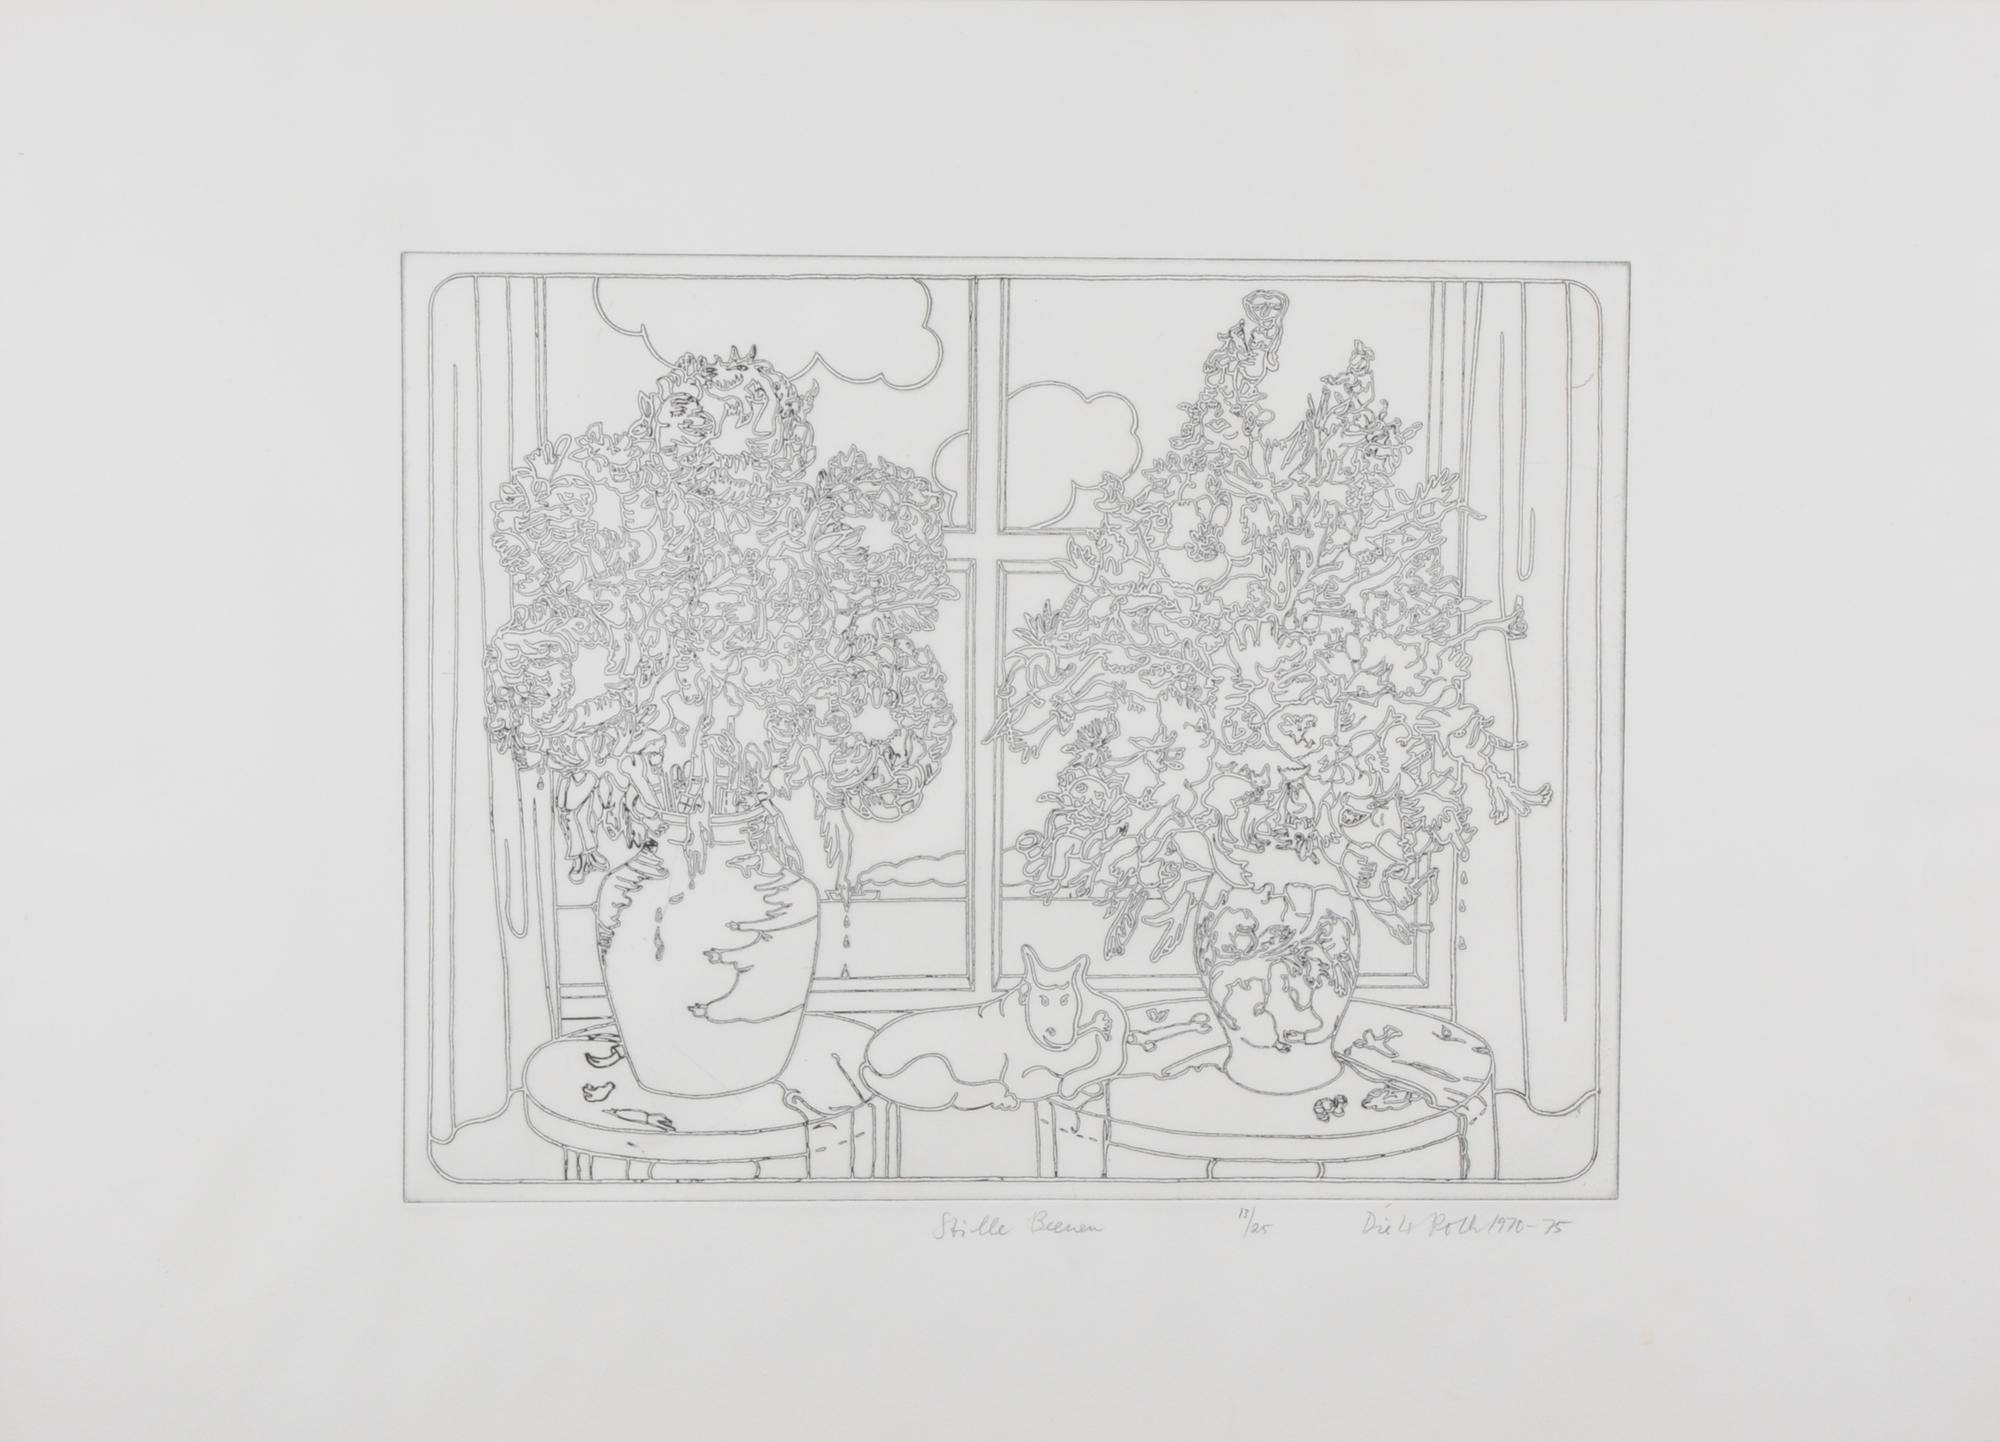 Roth Dieter, 2 Blätter: Horizonttiere an der Arbeit, 1974; Stille Beenen, 1970-75